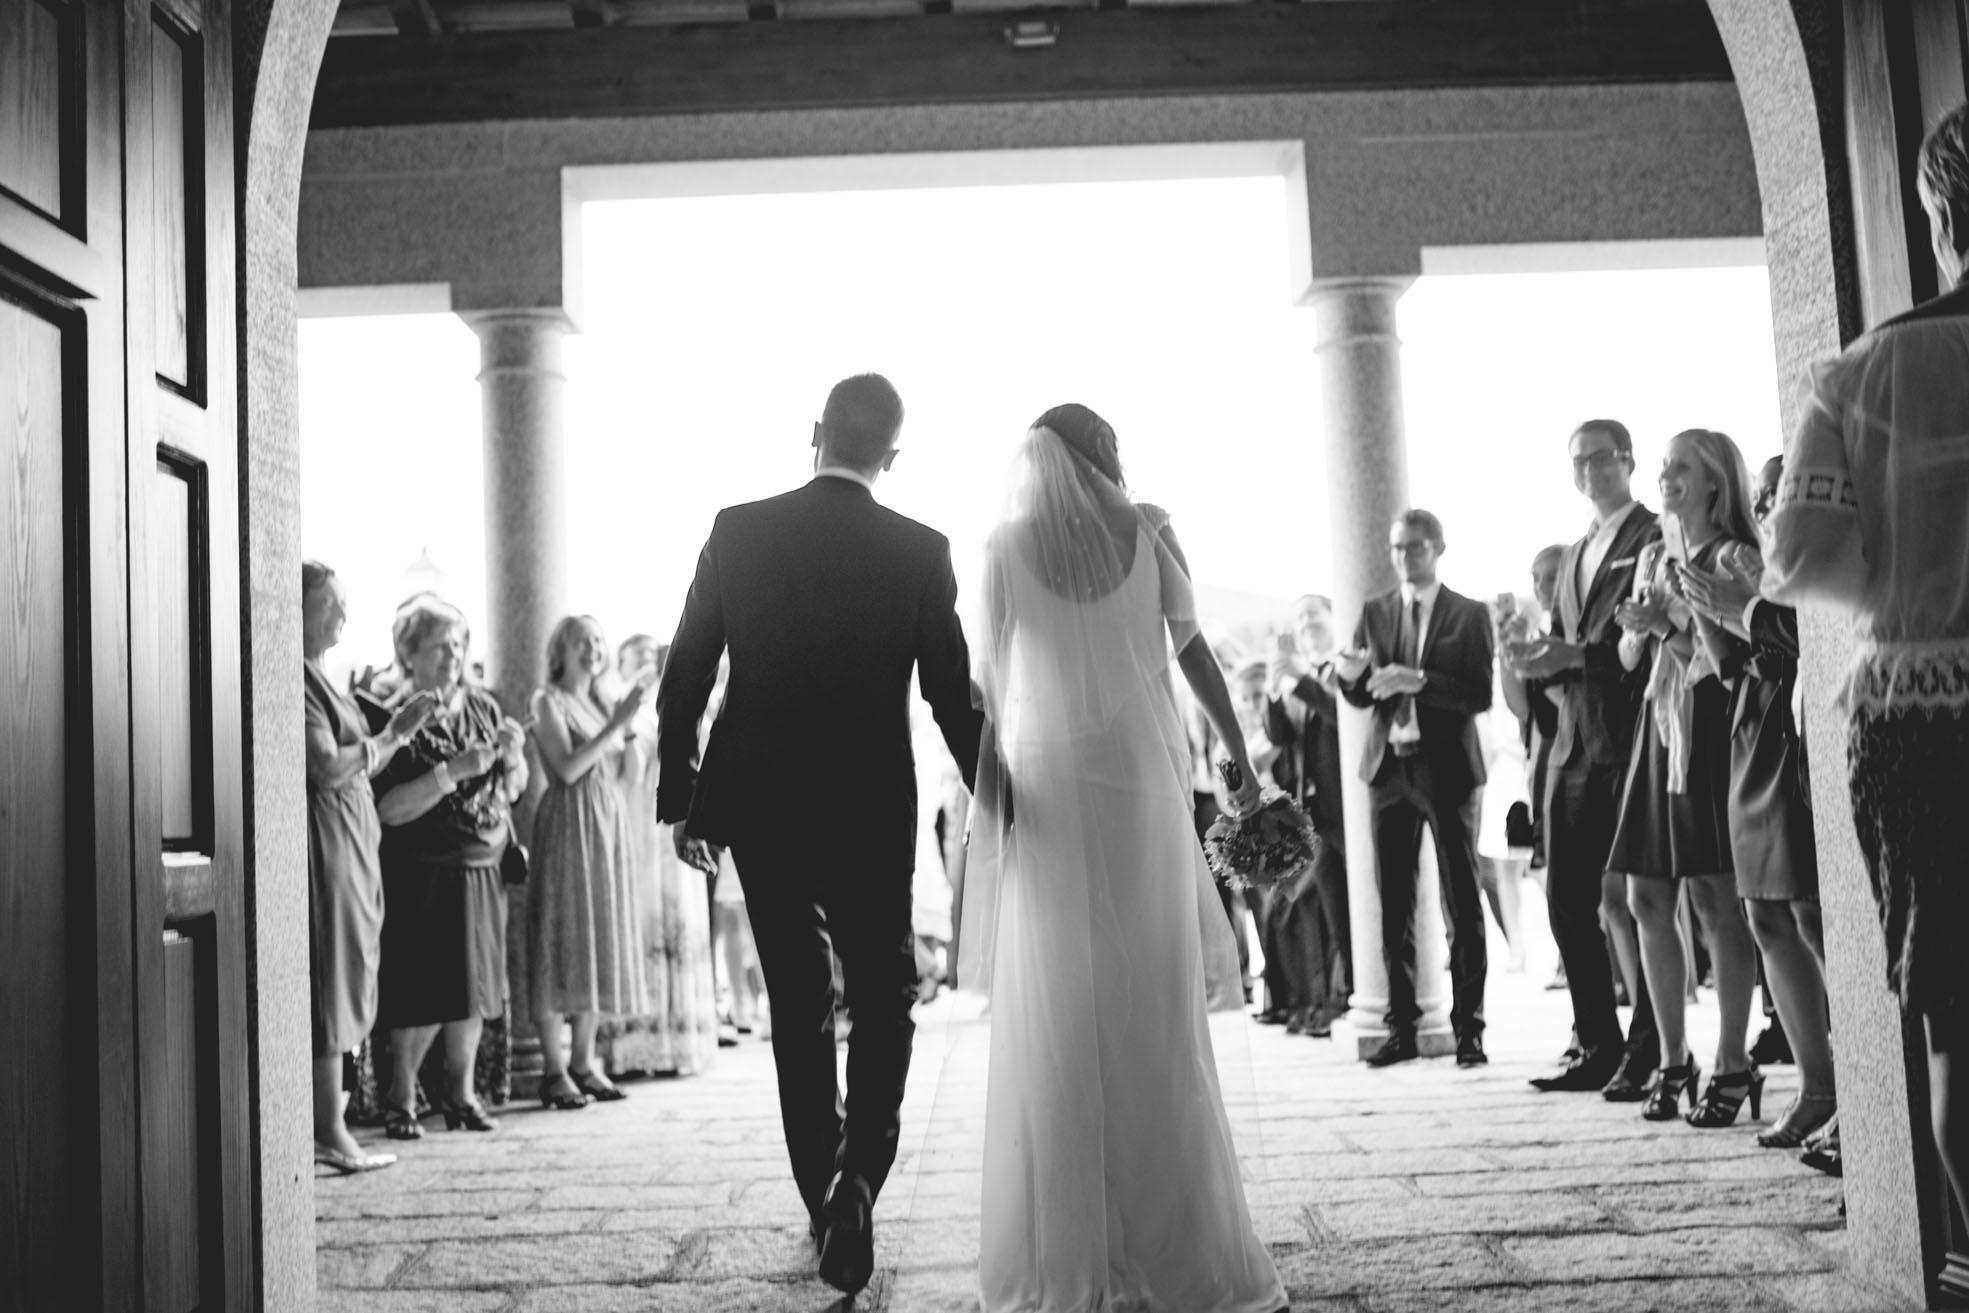 Photographe mariage ile de france, jean-Baptiste Chauvin, photographe de mariage, photographe idf, www.studioart-photographe.fr, photographe mariage 75